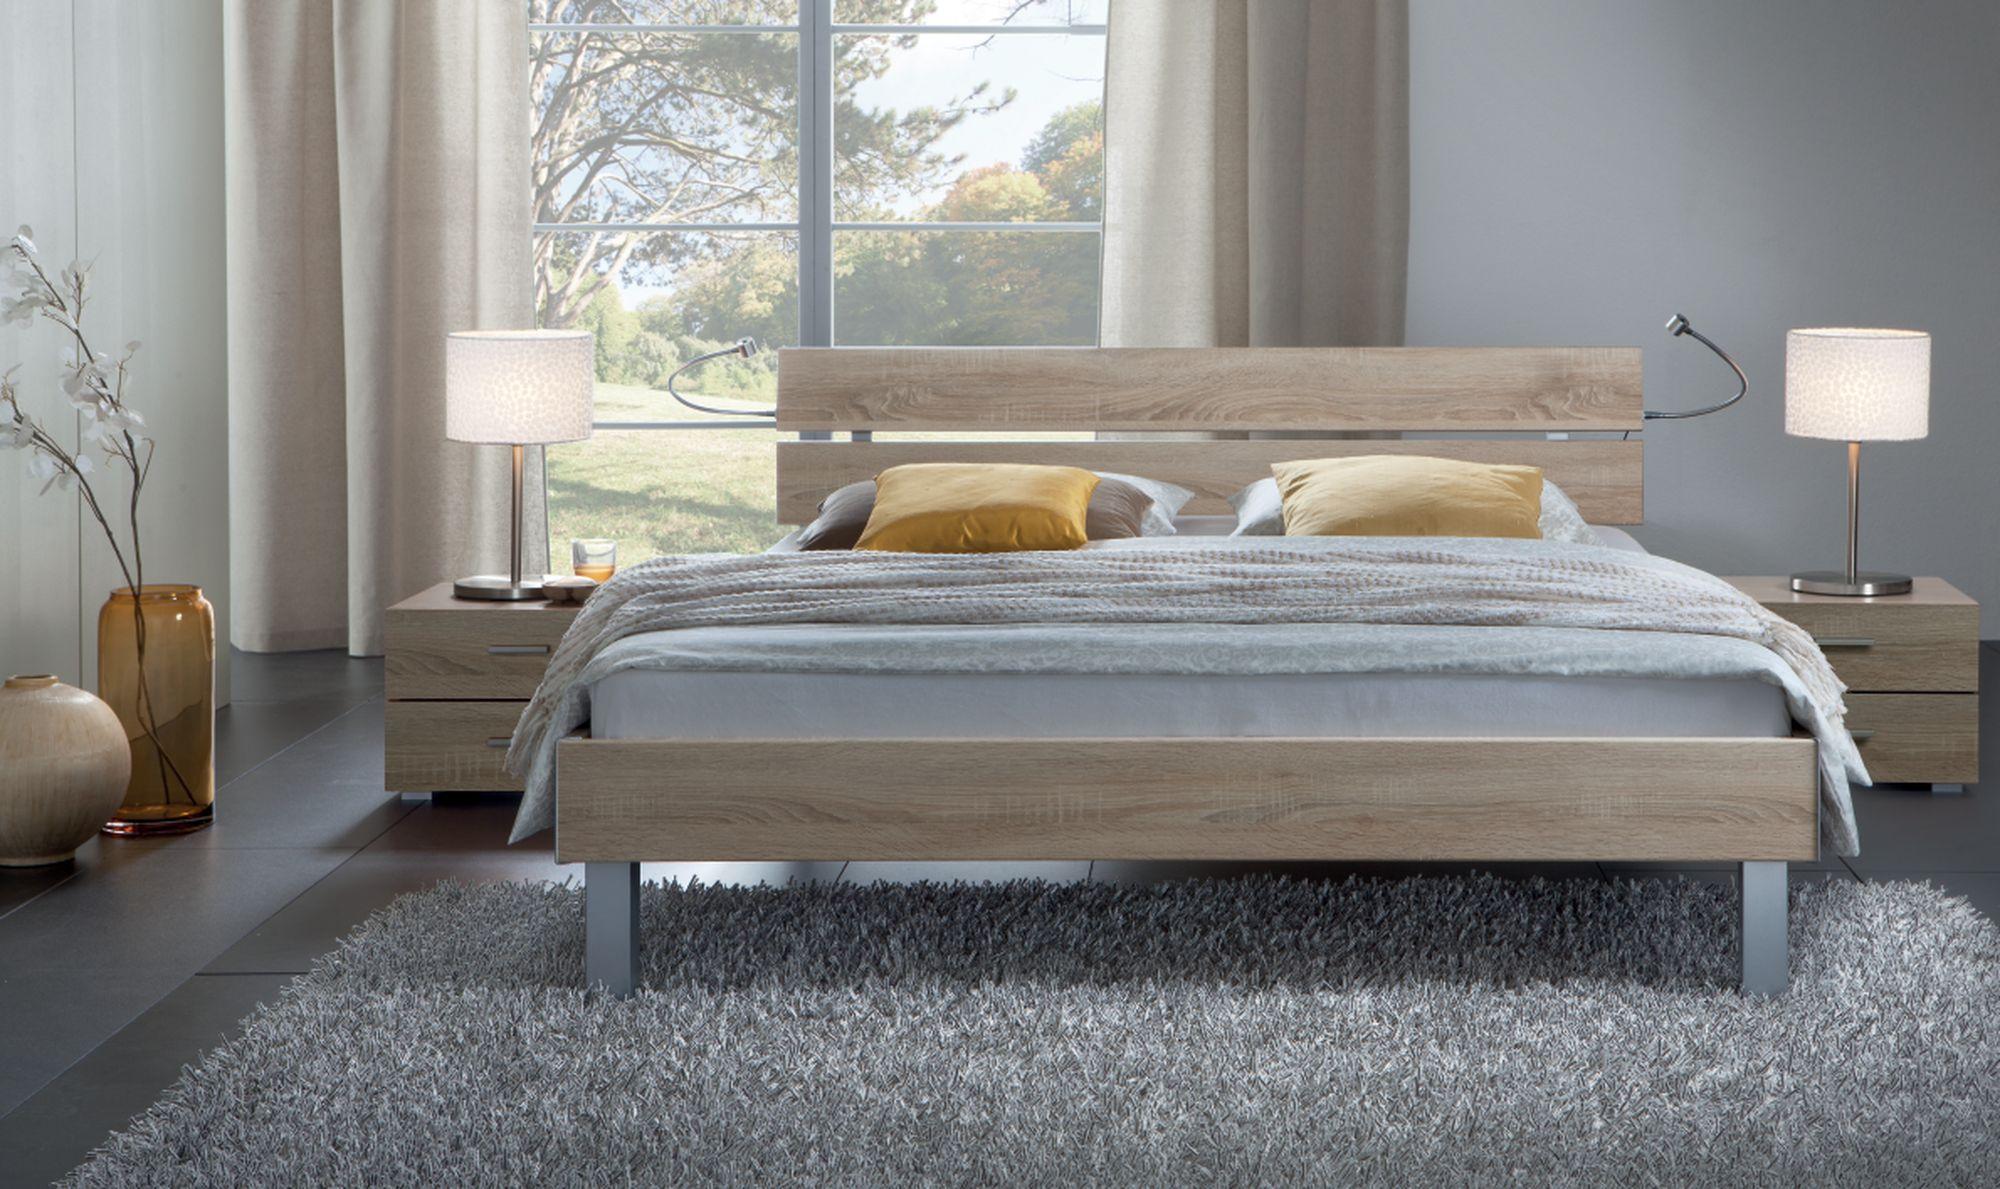 moderne betten schlaffabrik. Black Bedroom Furniture Sets. Home Design Ideas